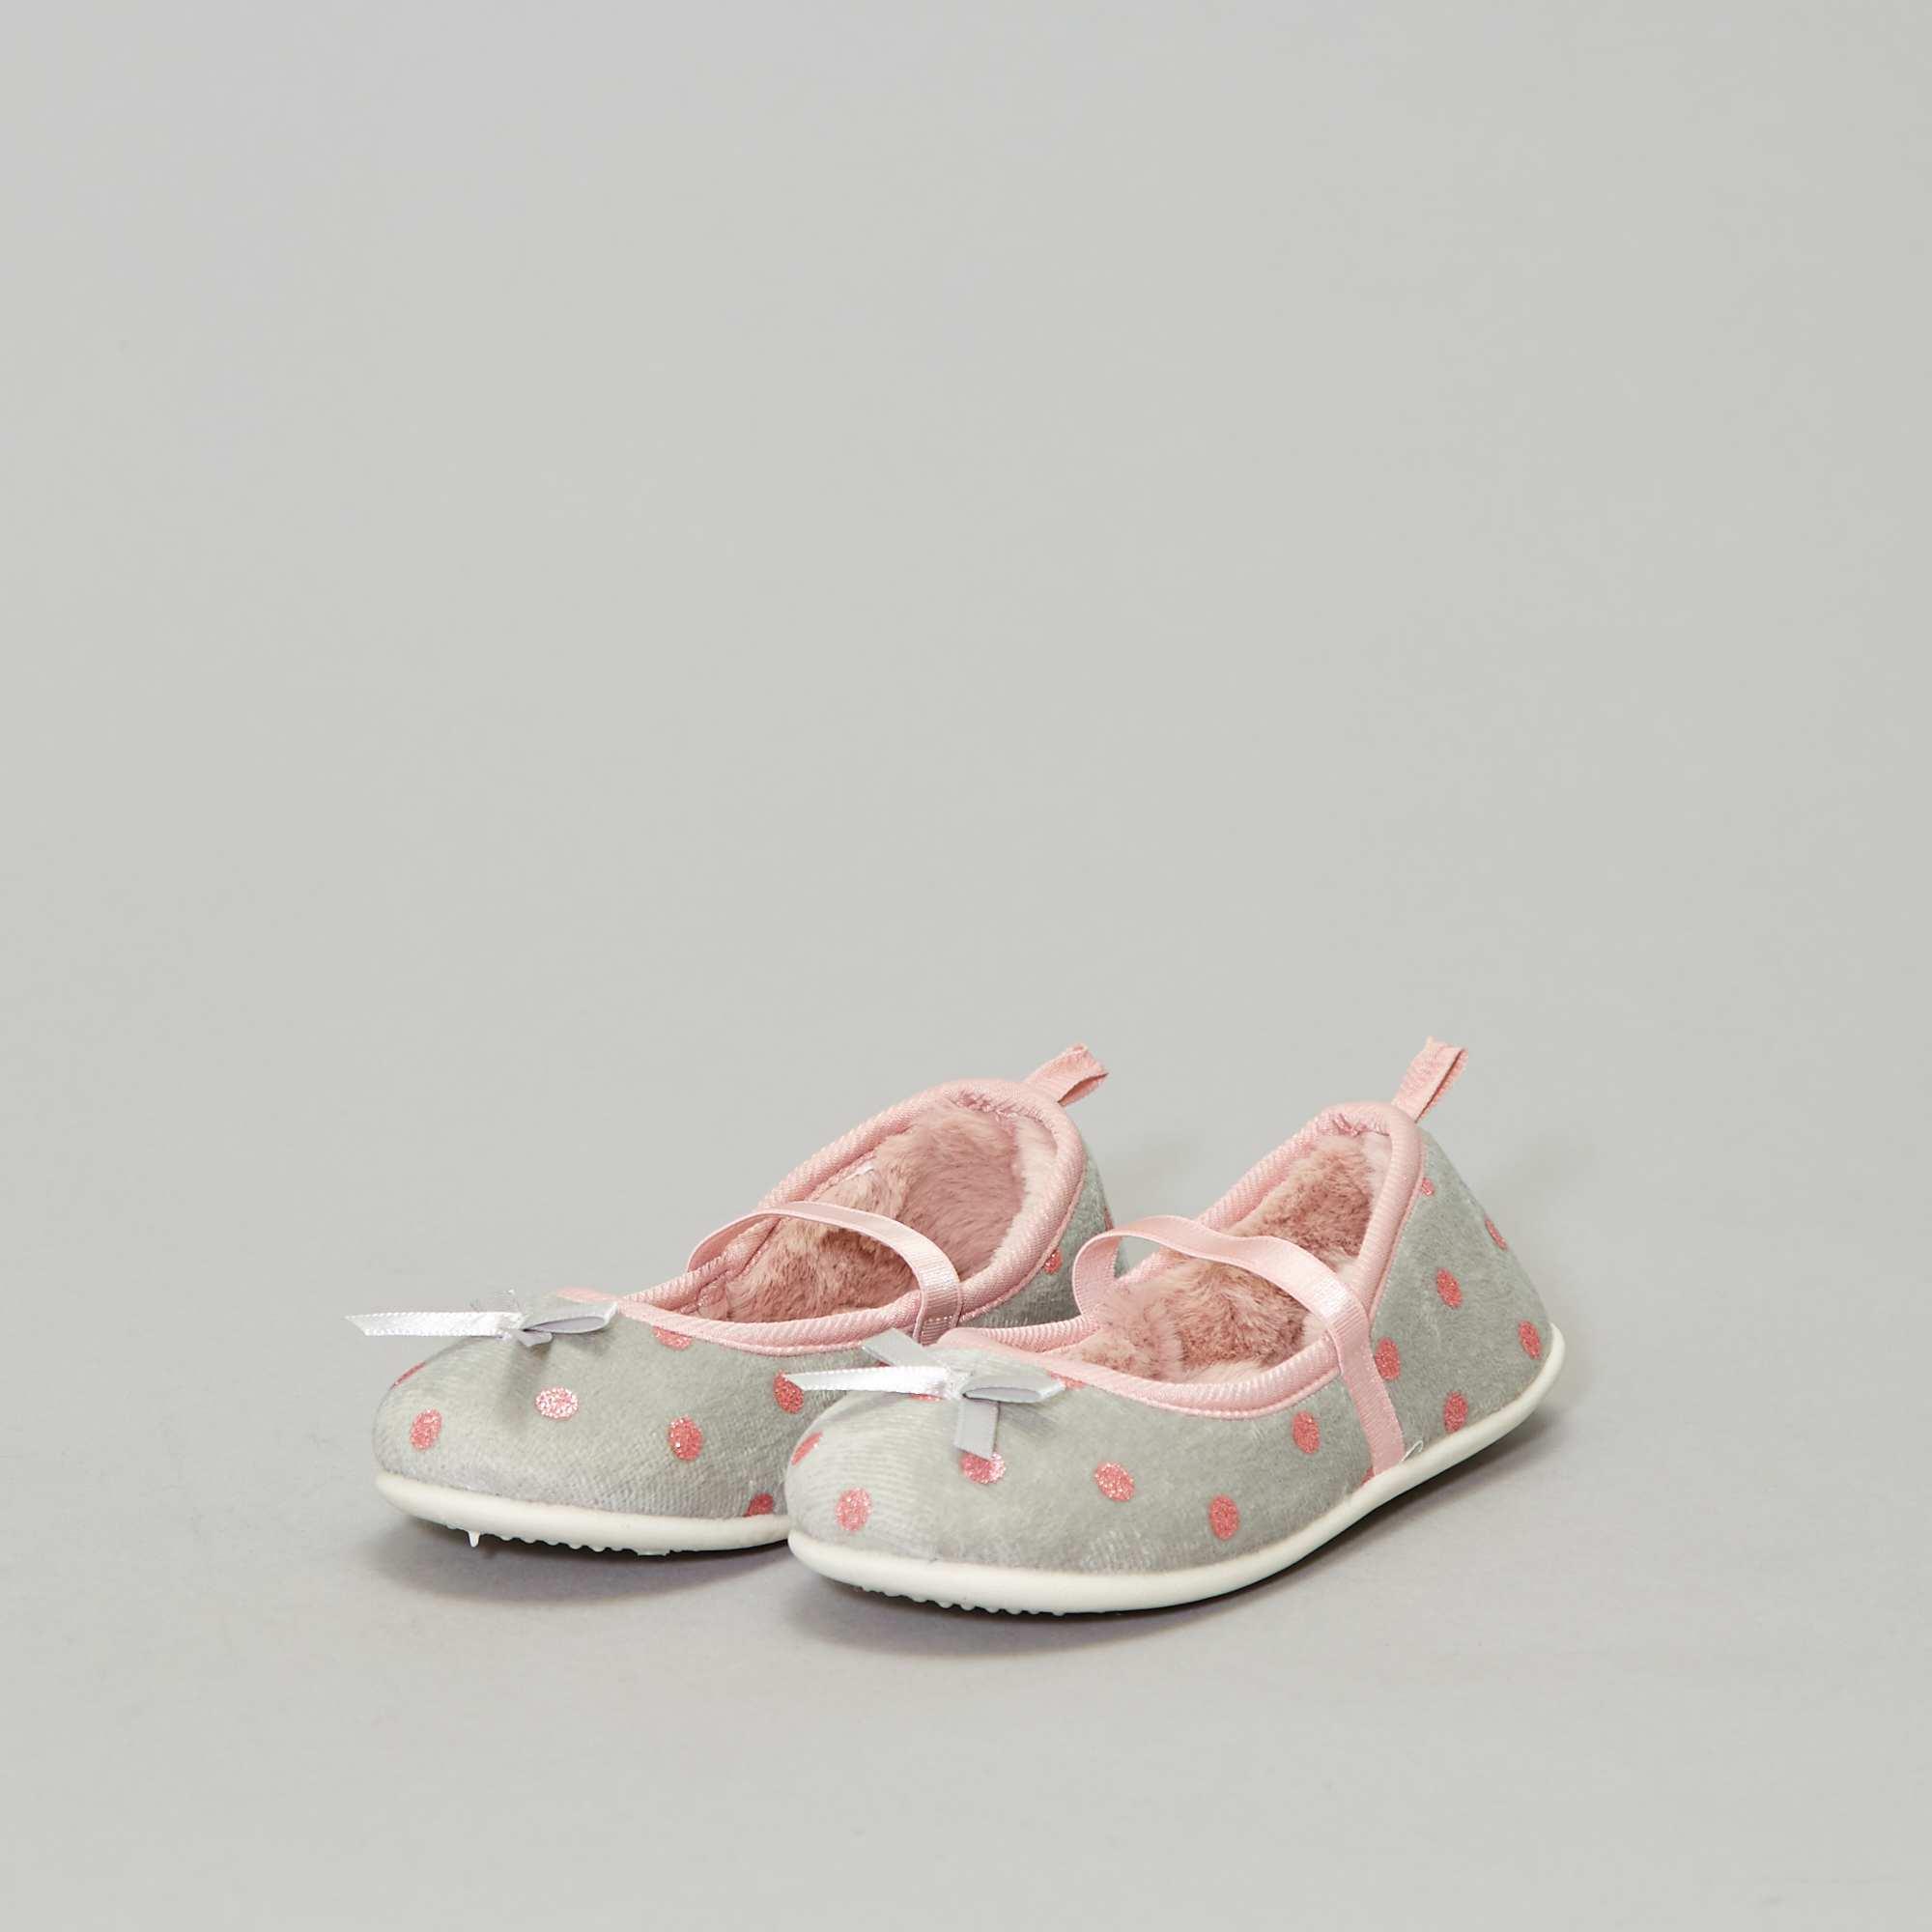 Calçado, pantufas Roupas de menina | tamanho 23 | Kiabi